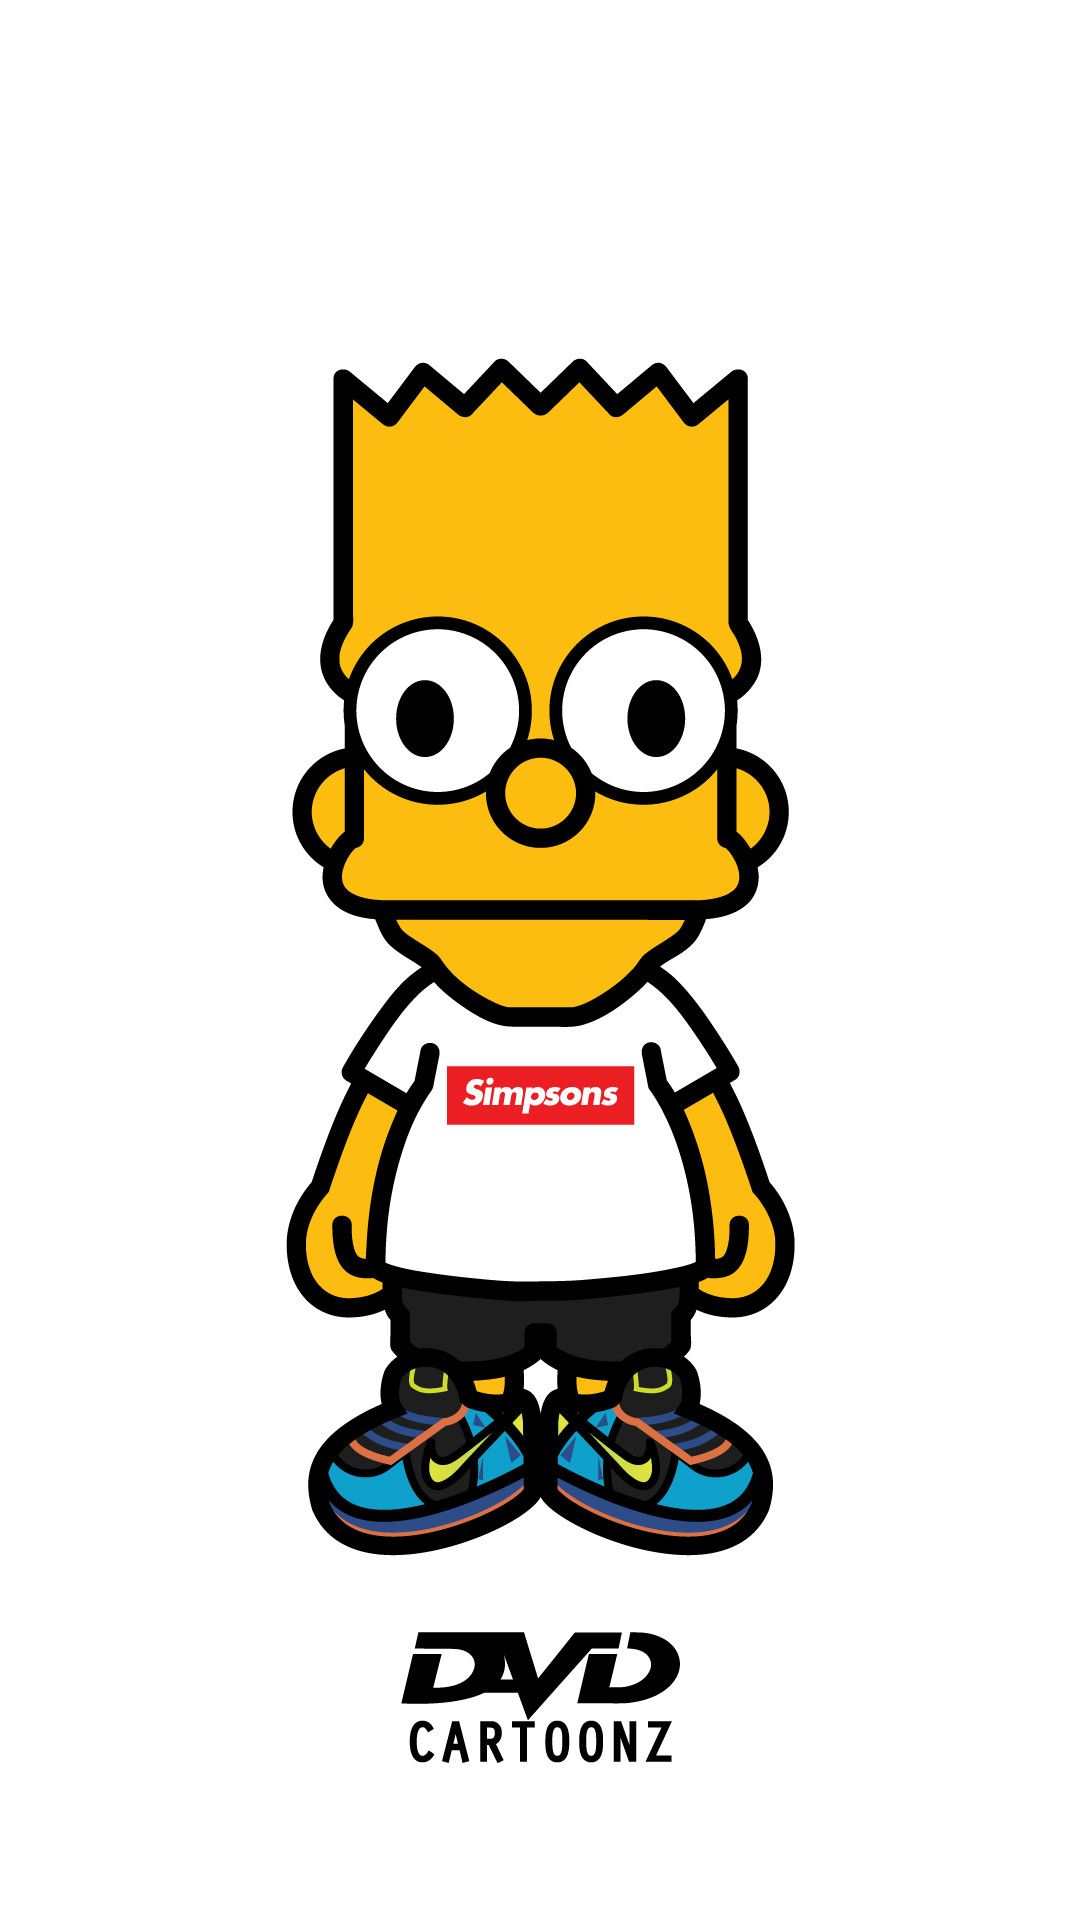 Supreme Simpsons HD Wallpapers - Top Free Supreme Simpsons ...